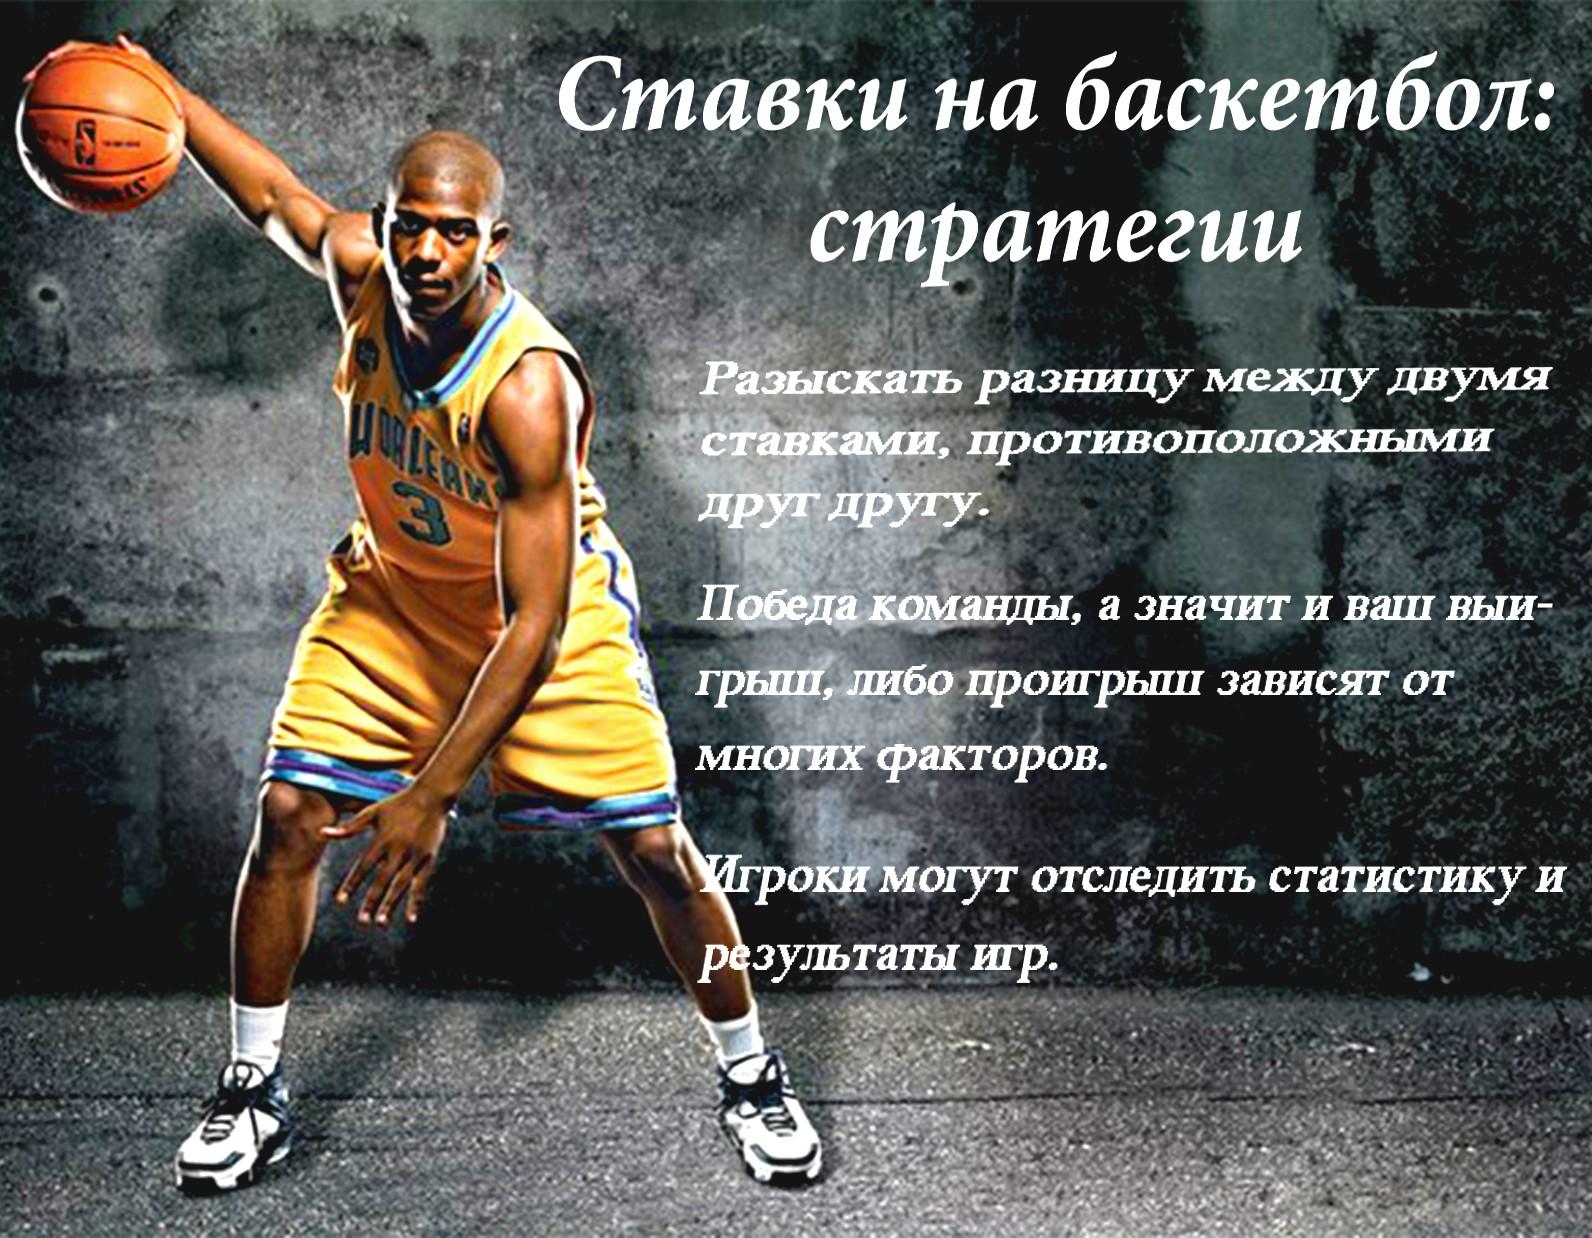 Ставки на баскетбол: стратегии